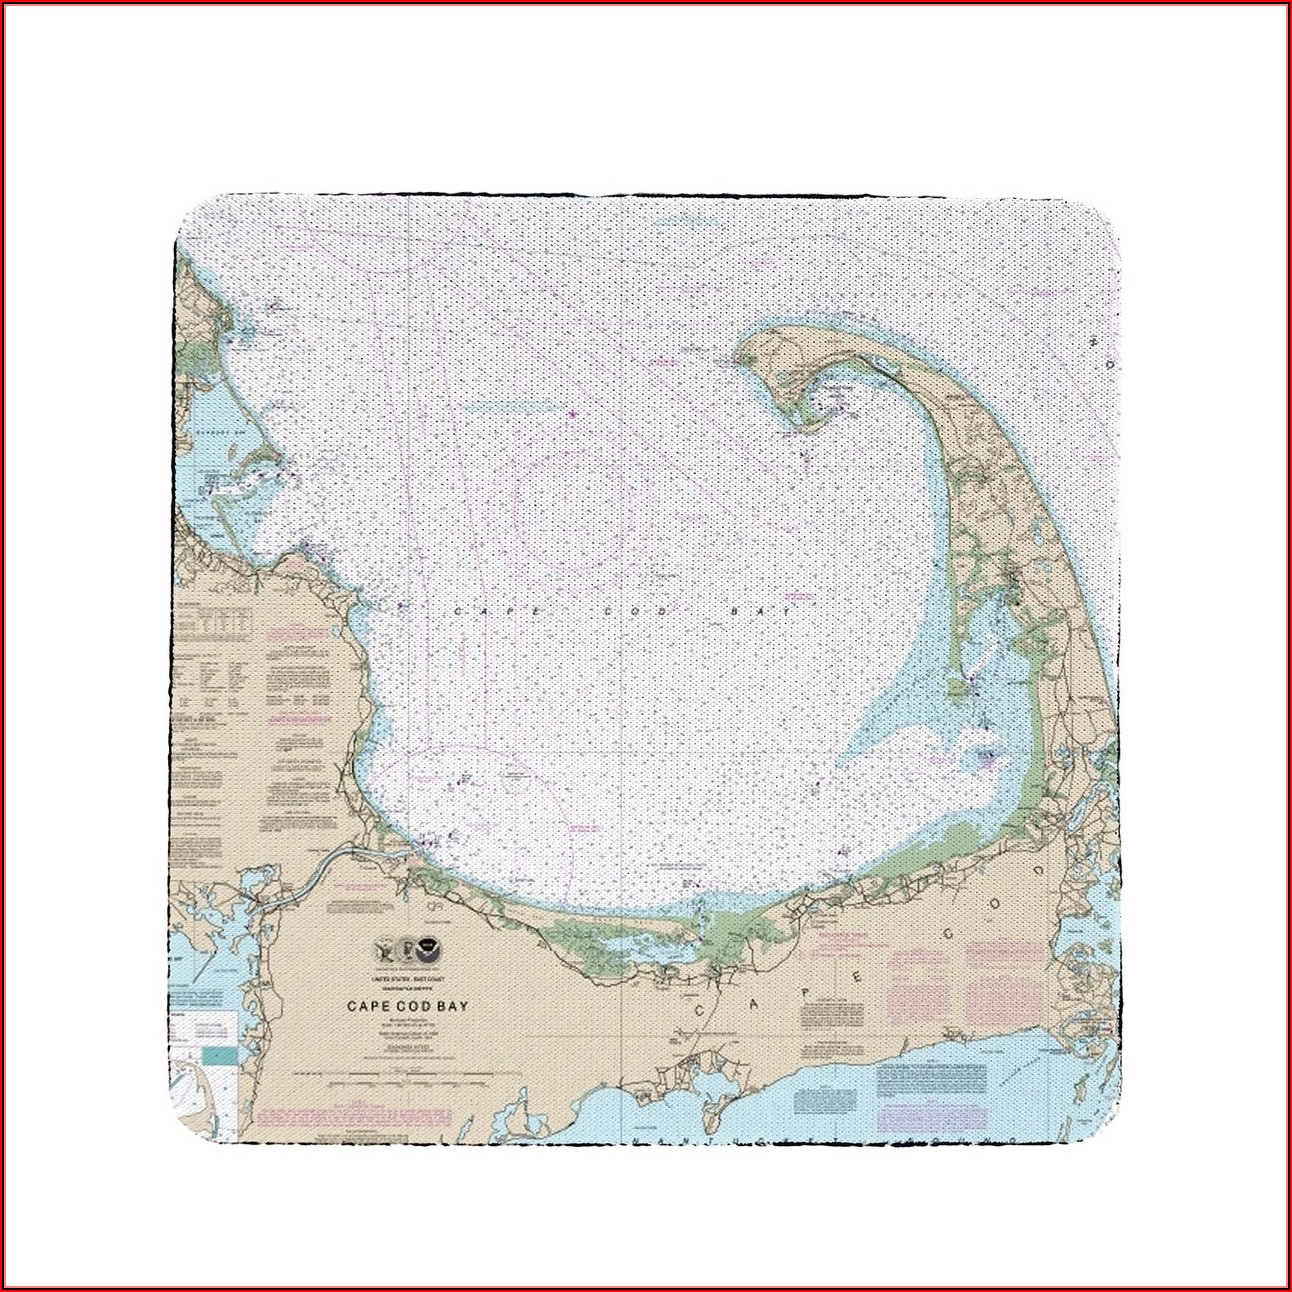 Nautical Map Of Cape Cod Bay